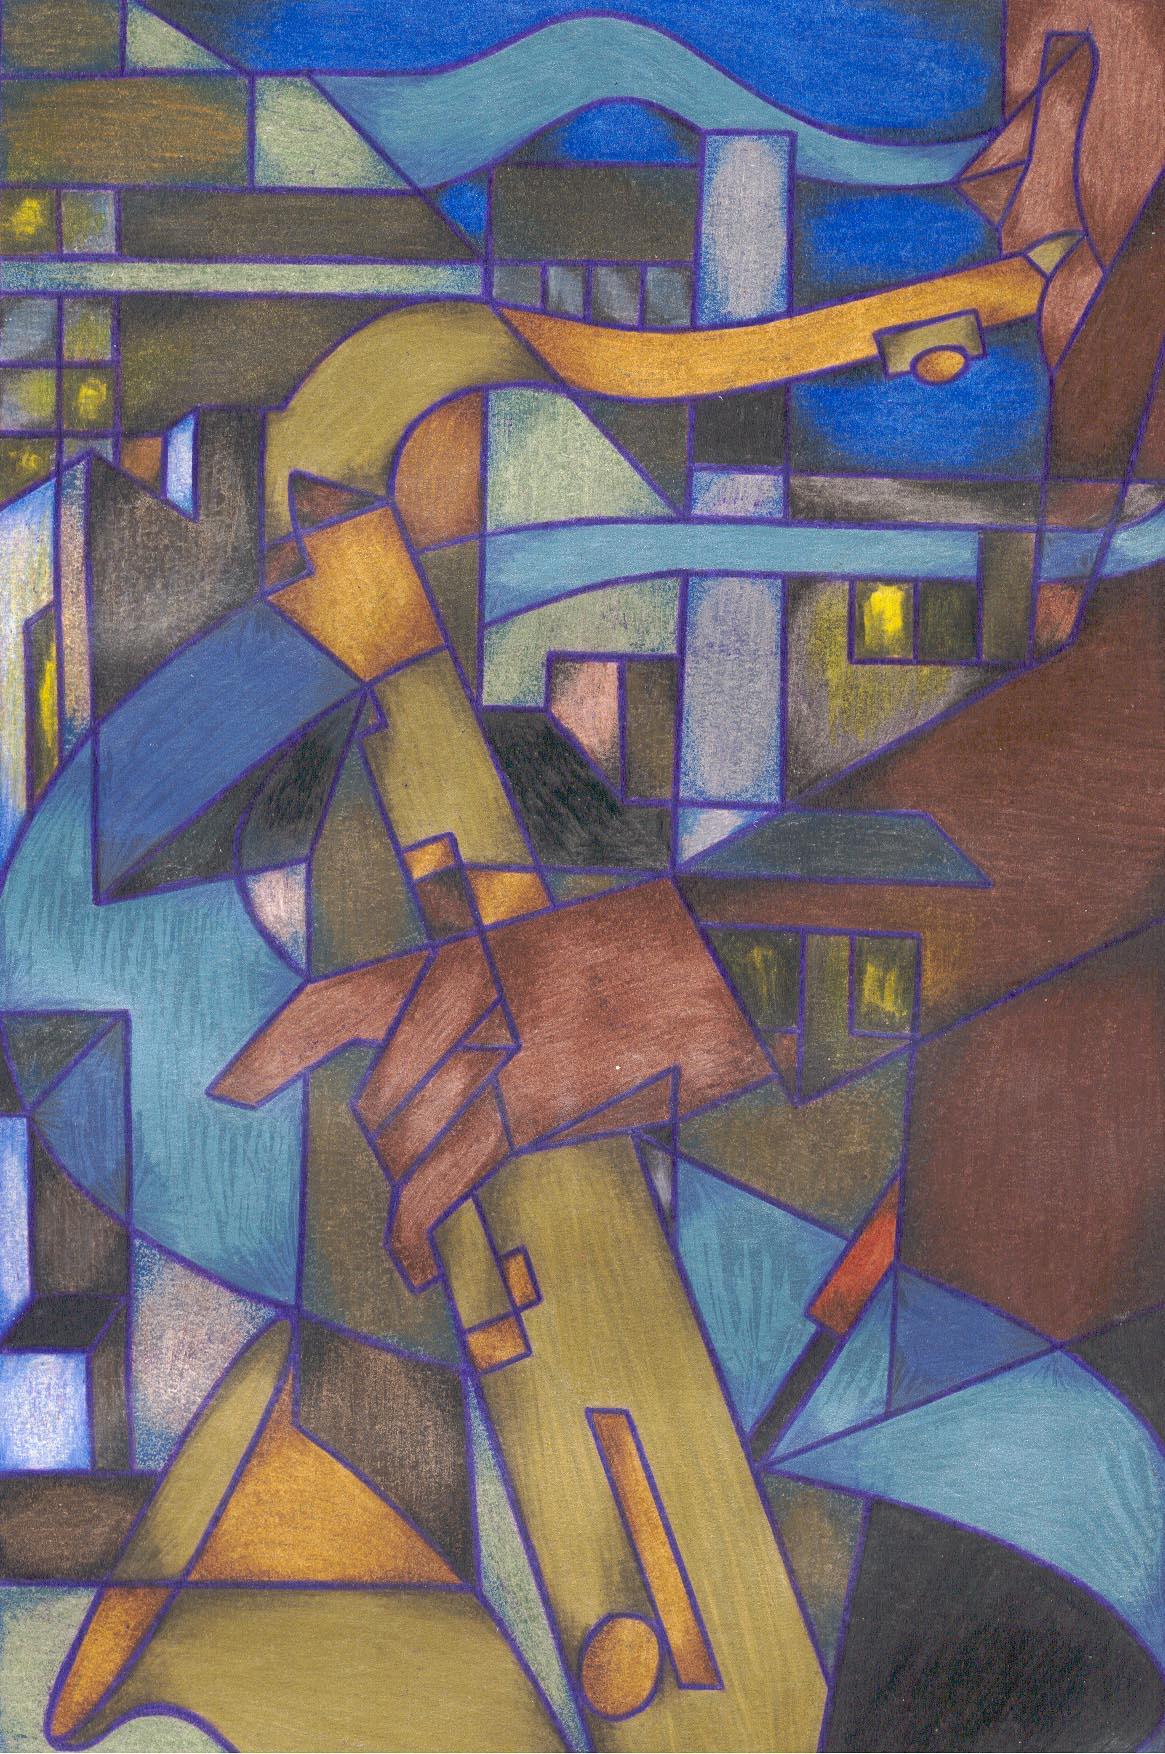 'Jazz Man'